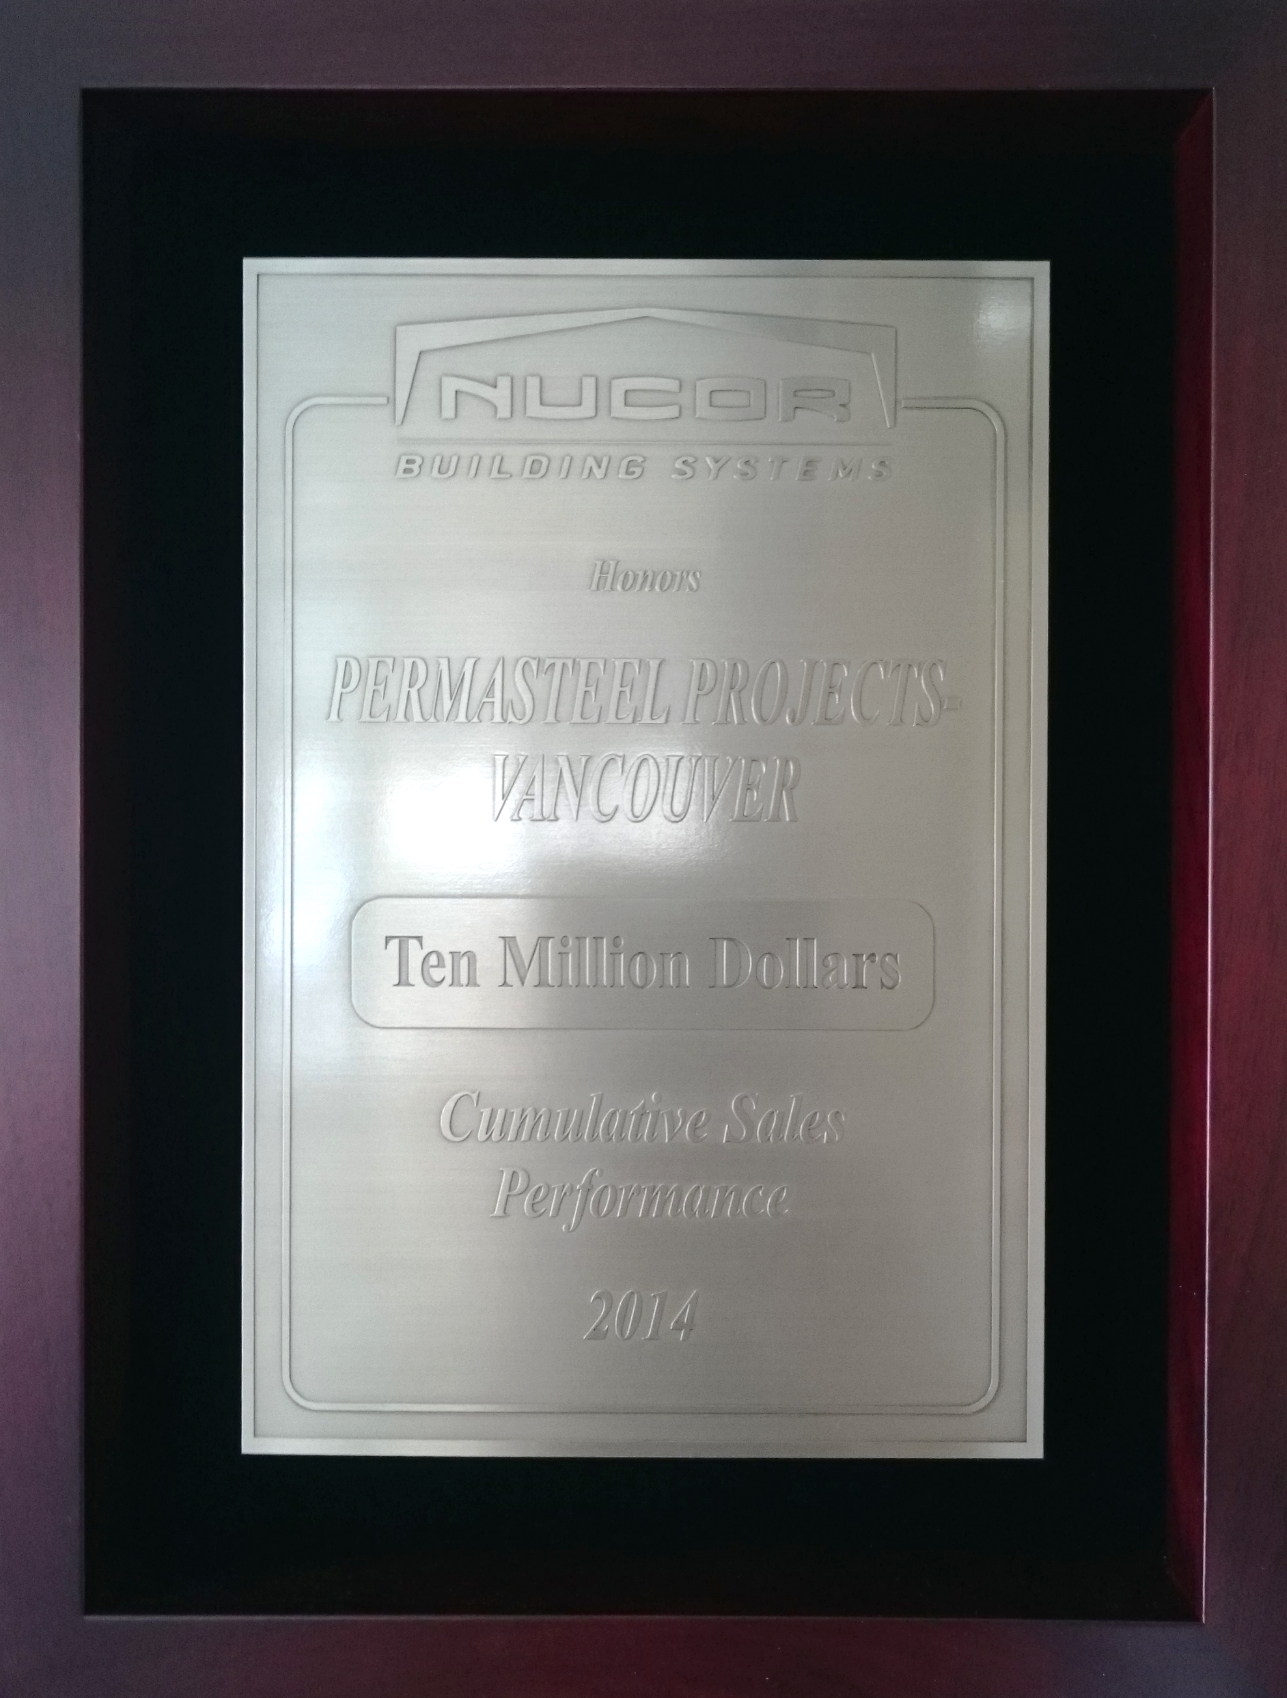 nucor-award.jpg